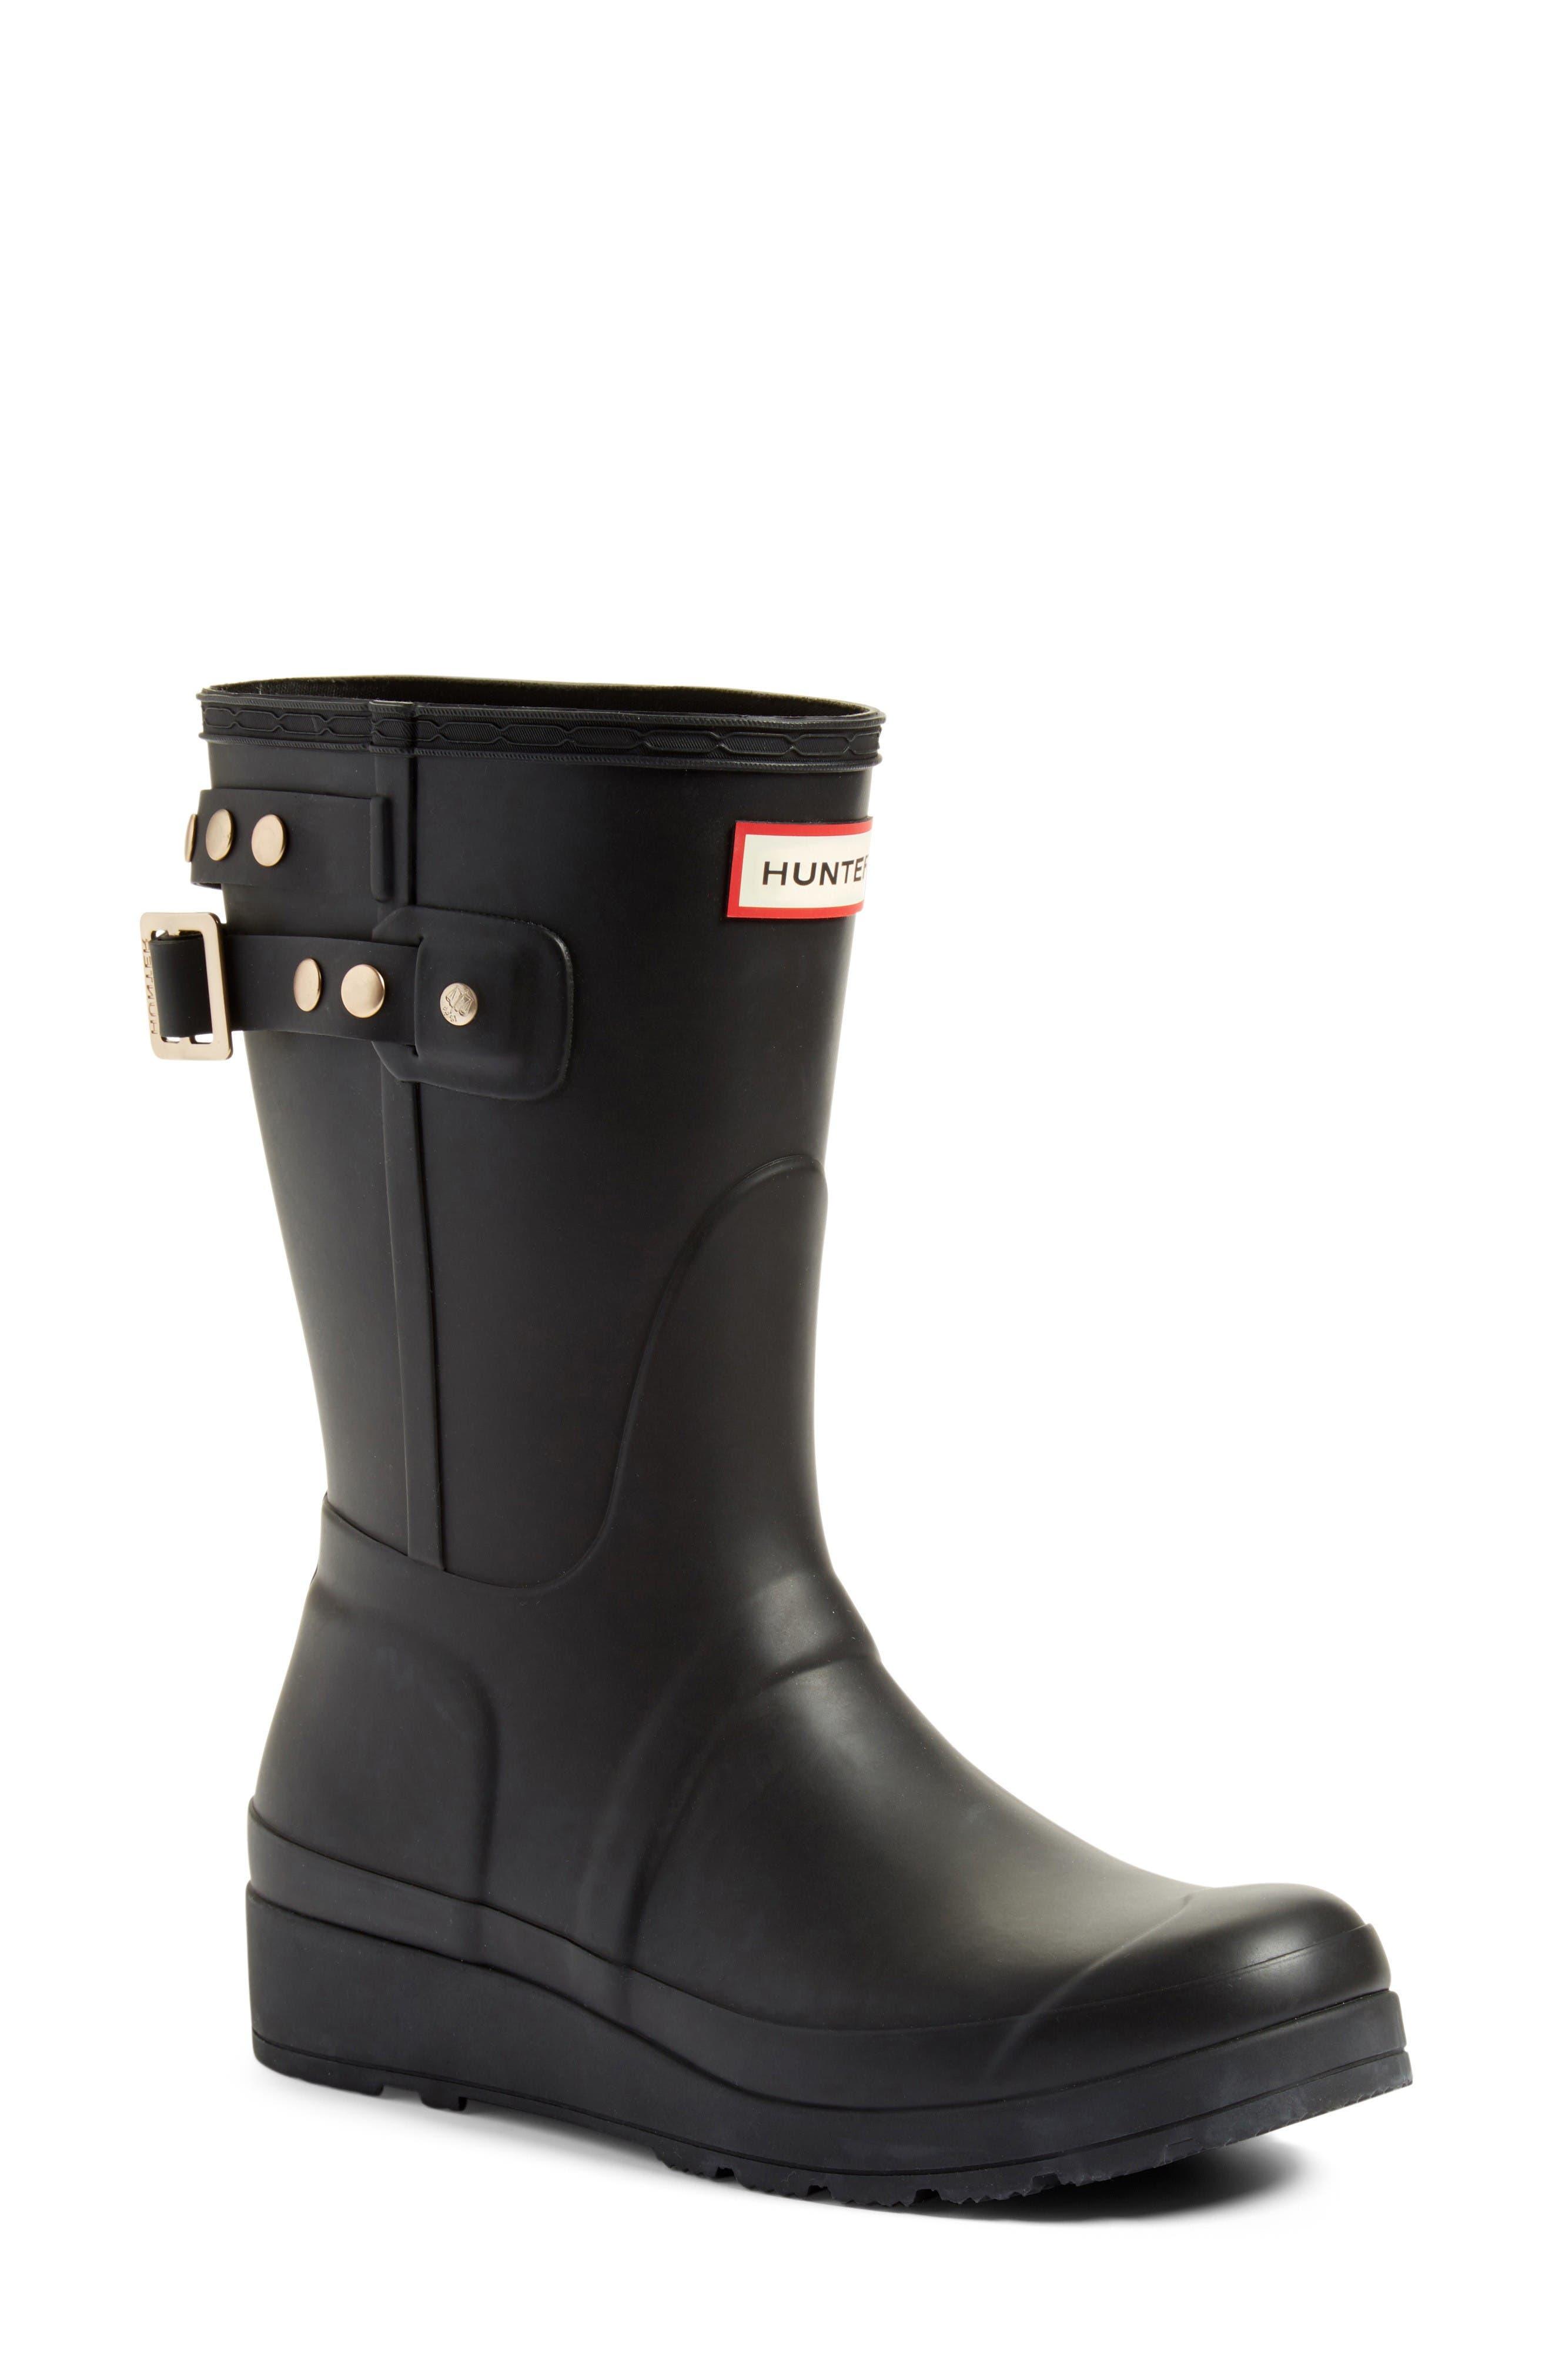 HUNTER Original Mid Calf Rain Boot